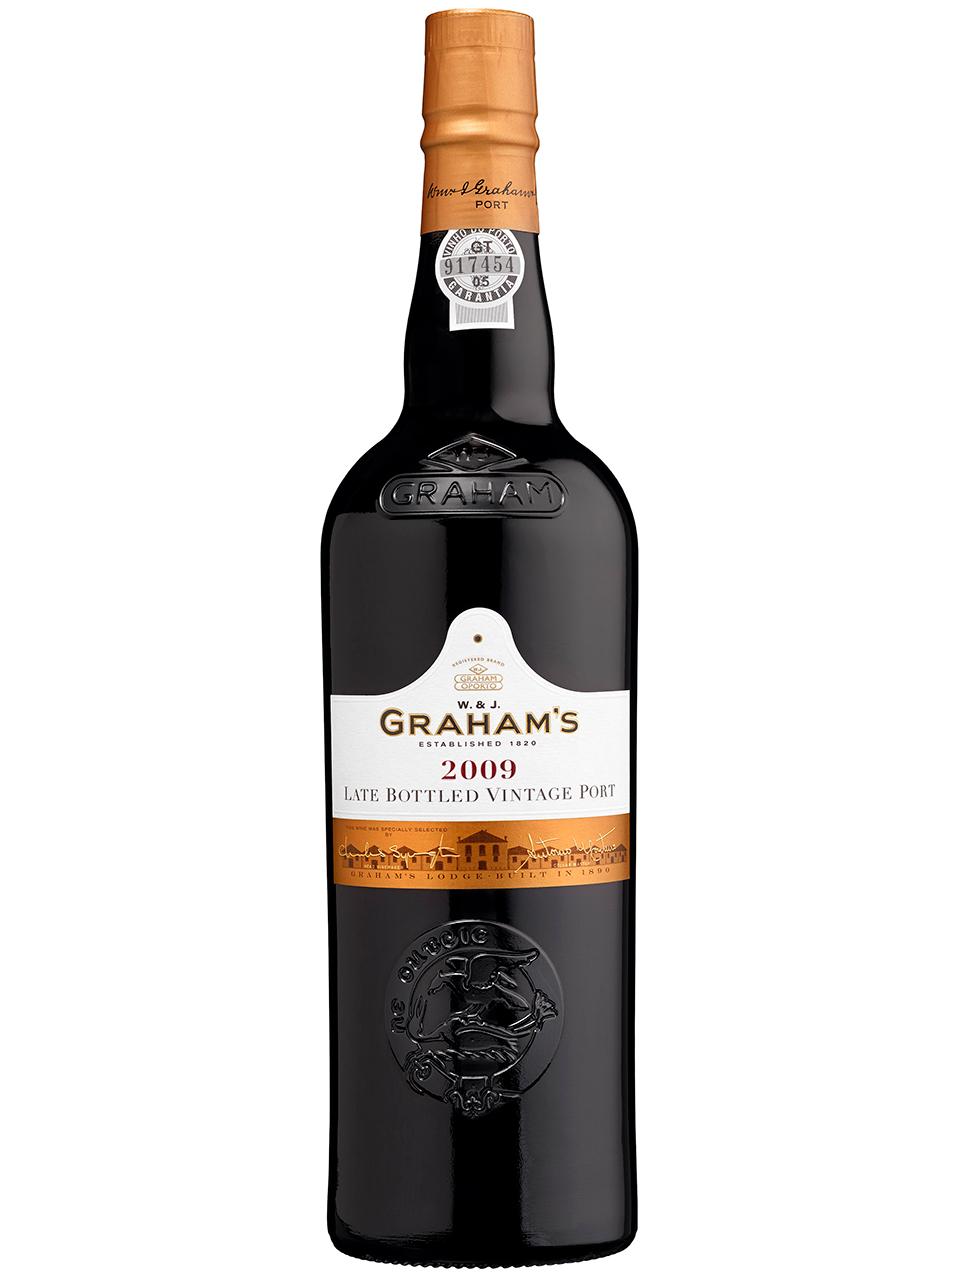 Graham's Late Bottled Vintage Port